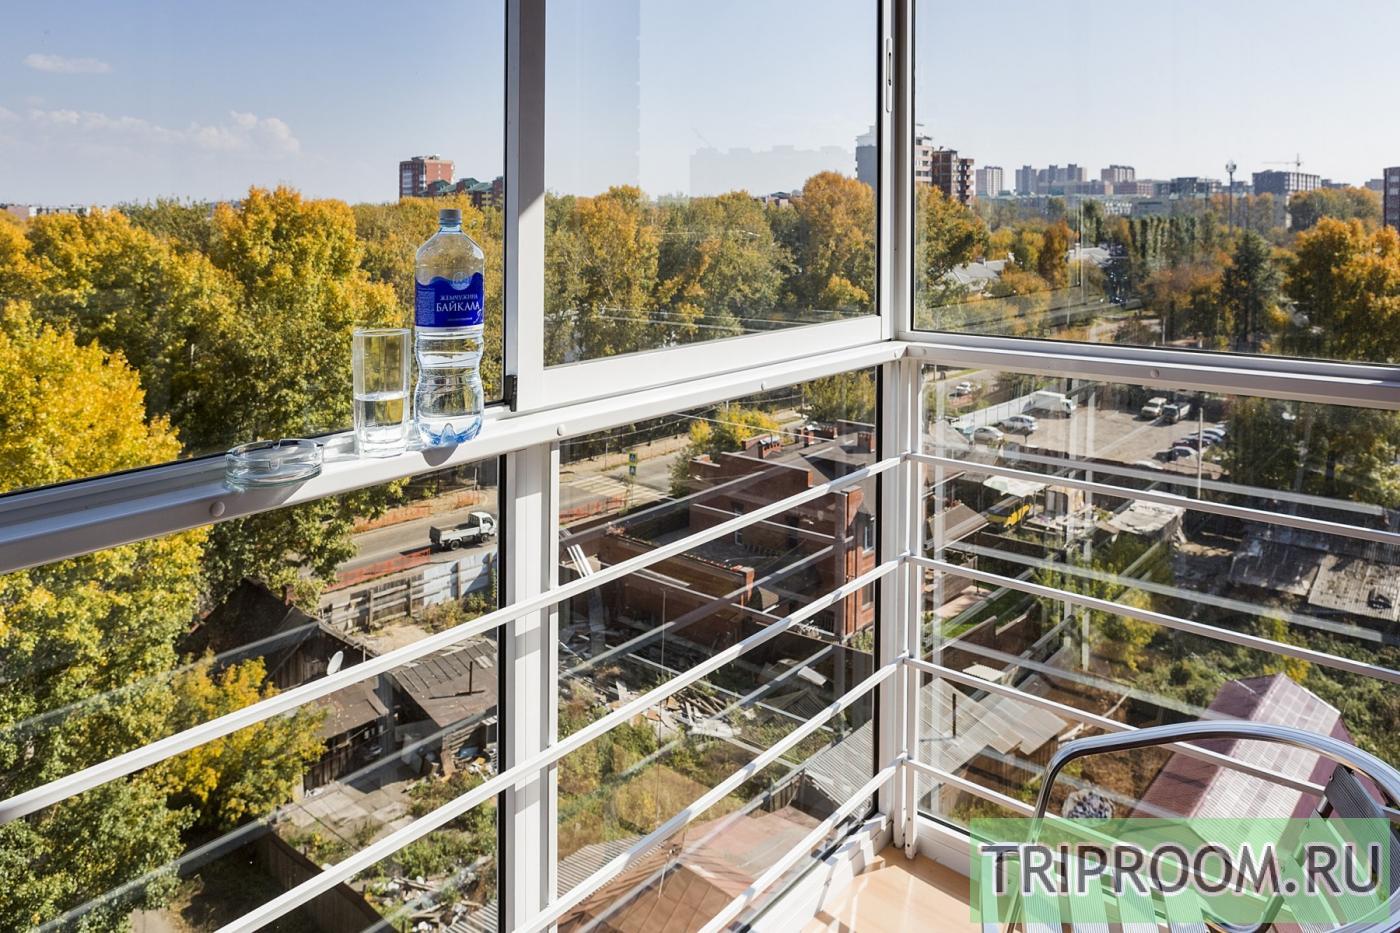 1-комнатная квартира посуточно (вариант № 35709), ул. Ядринцева улица, фото № 9